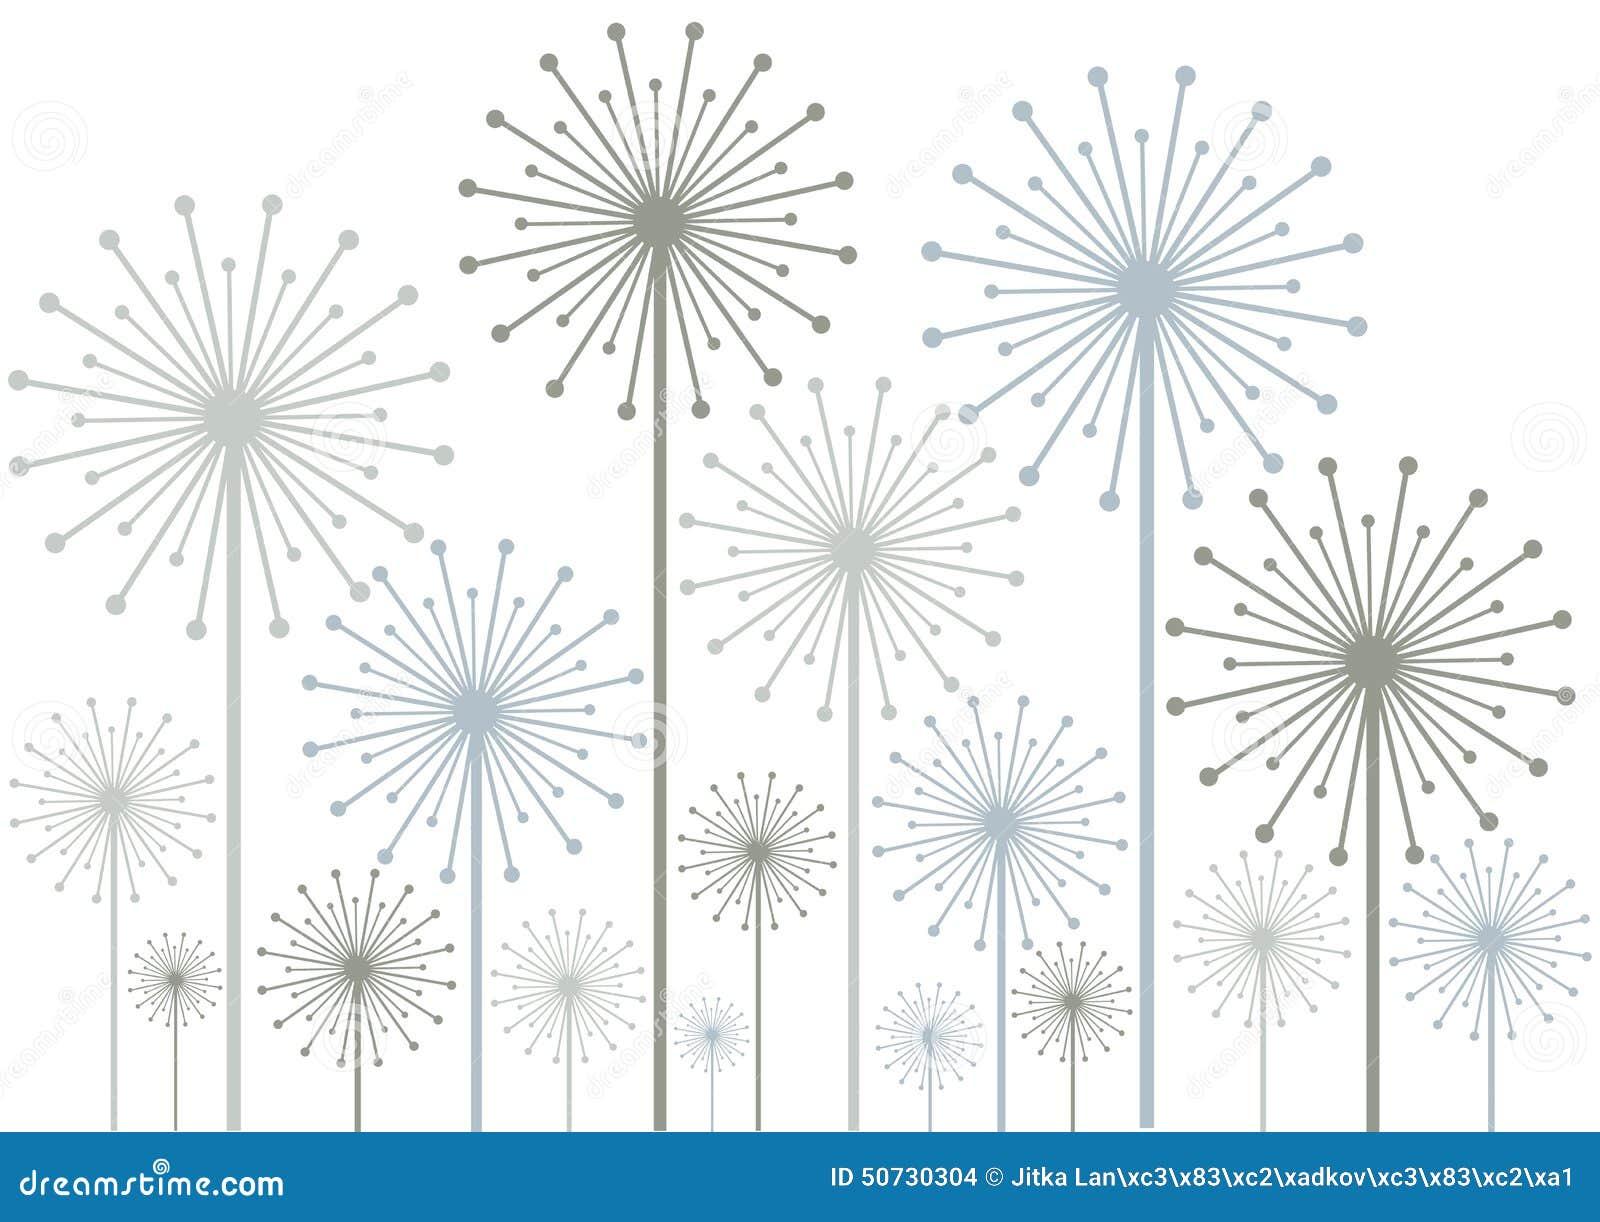 Dandelions Silhouettes On White Background Stock Illustration